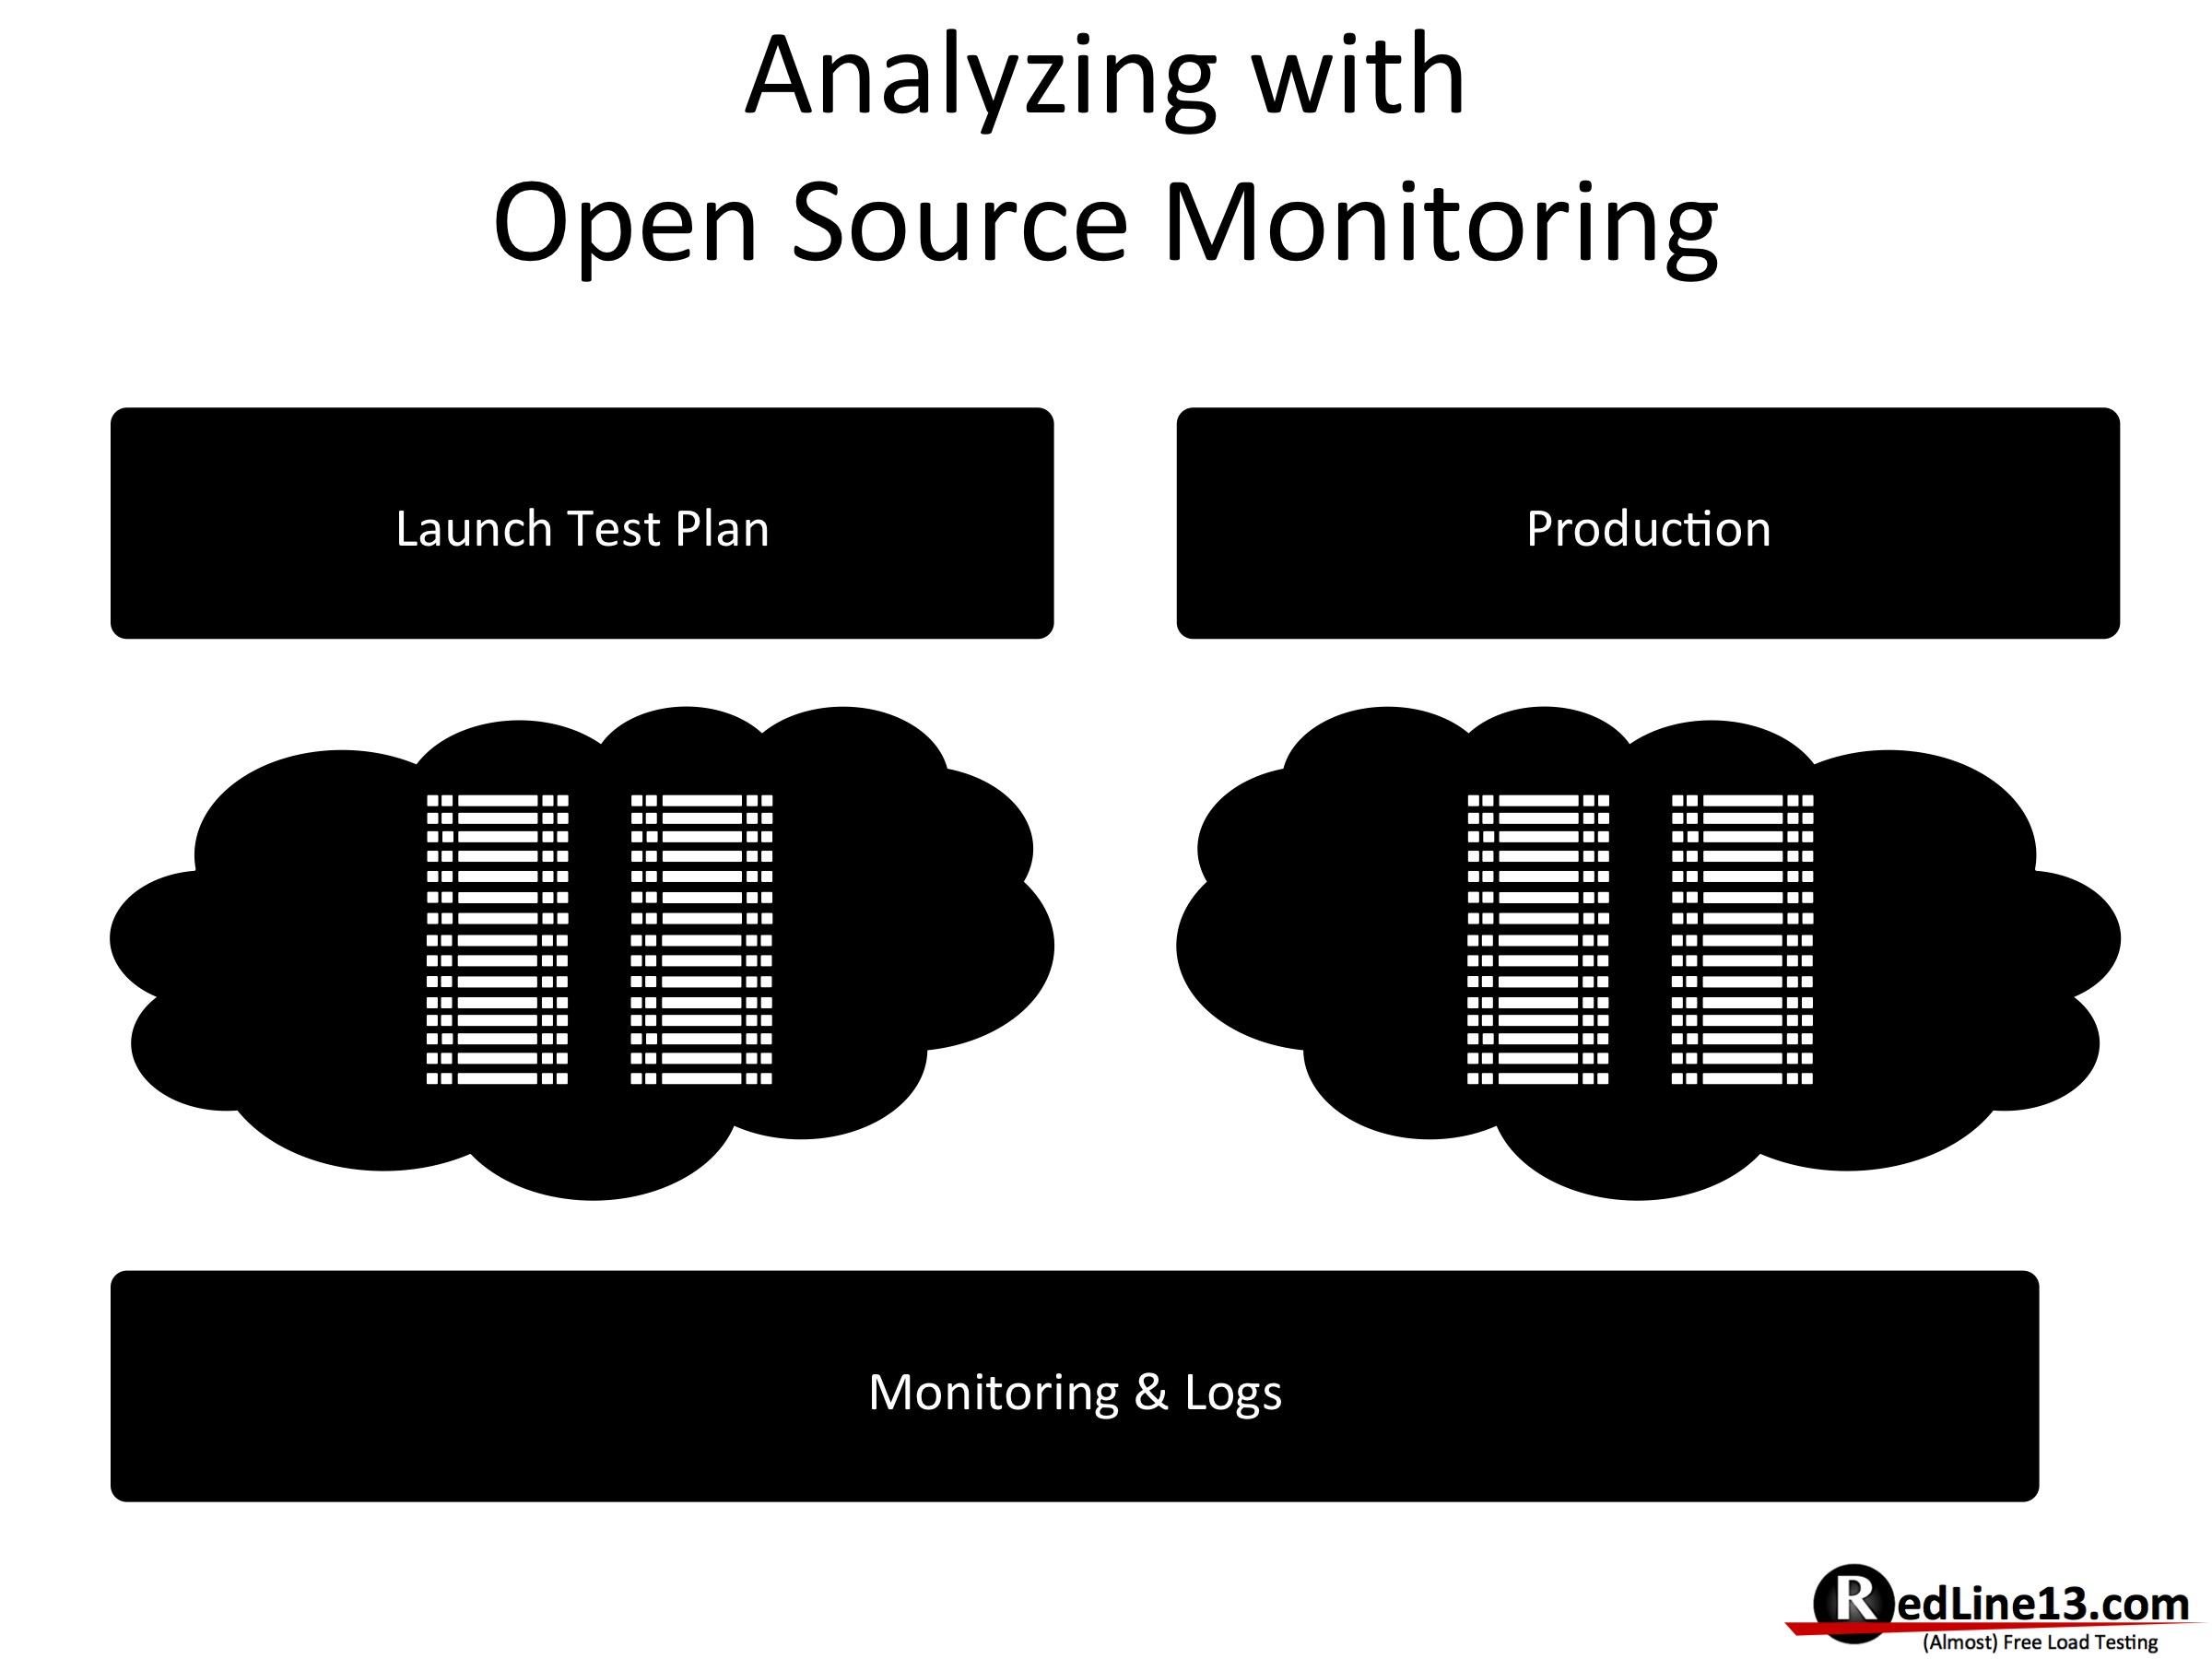 OSLT_Analyzing